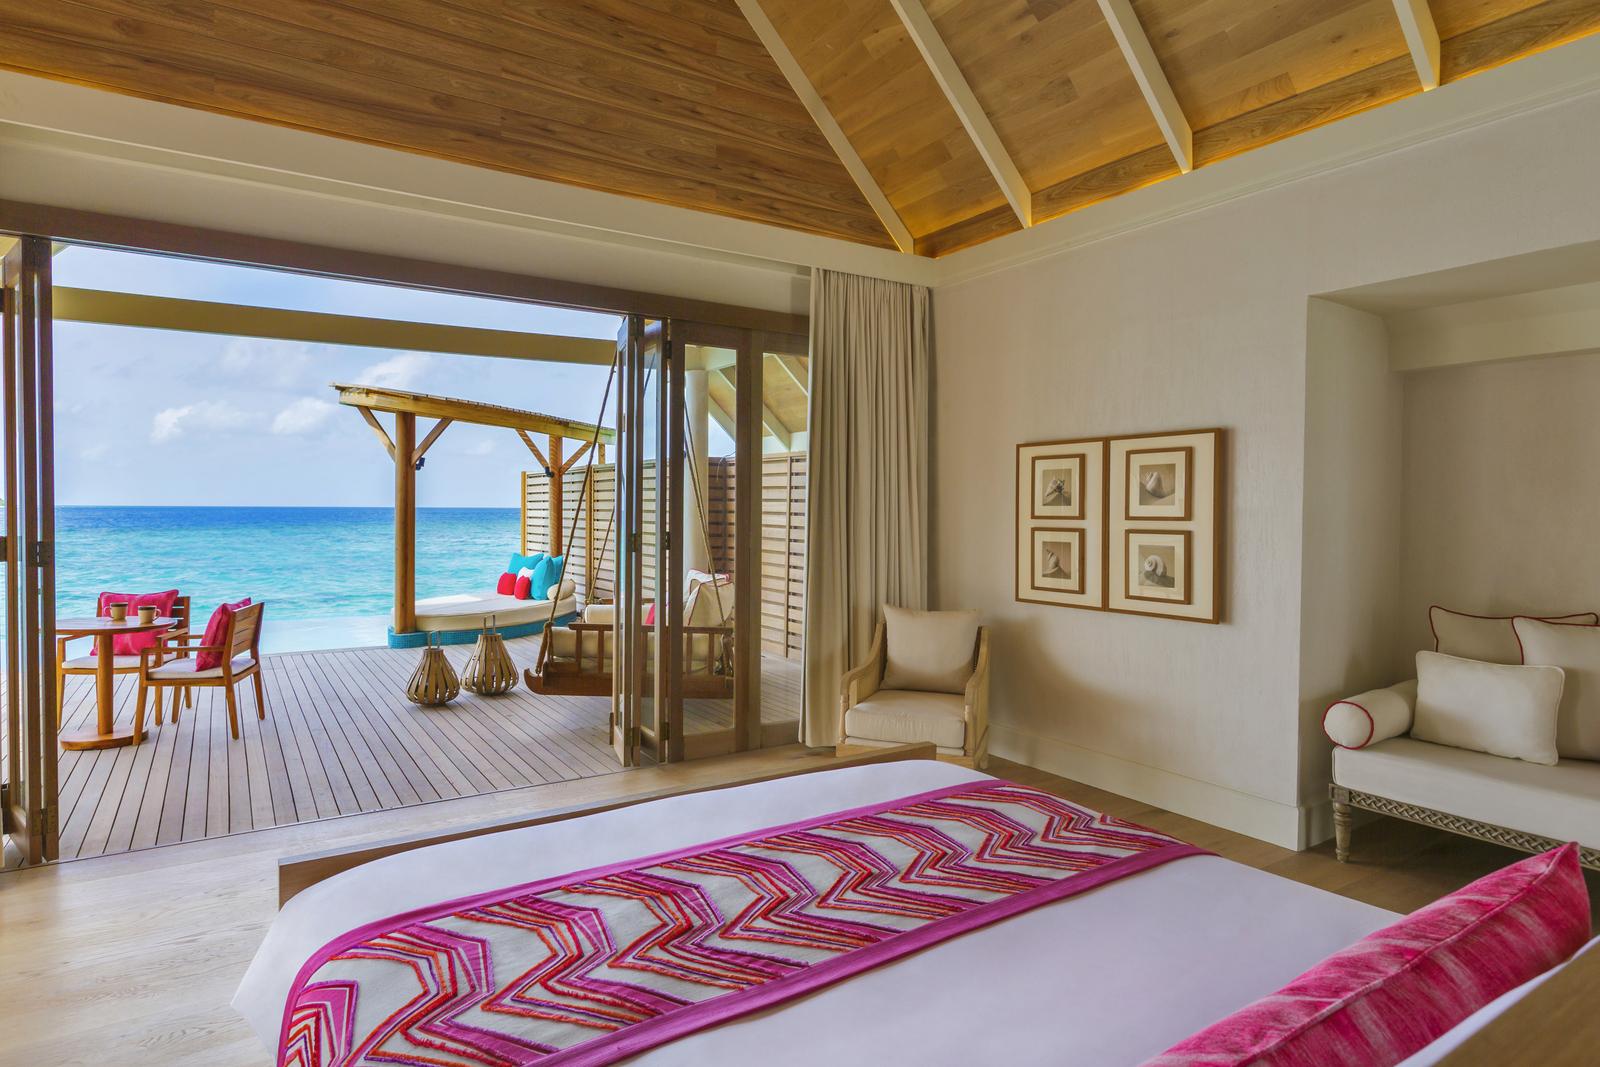 Malediven    die neue Trauminsel Milaidhoo im Baa Atoll strand sonne reisebericht malediven honeymoon 2  TUI Berlin Milaidhoo Maldives Water Pool Villa 6